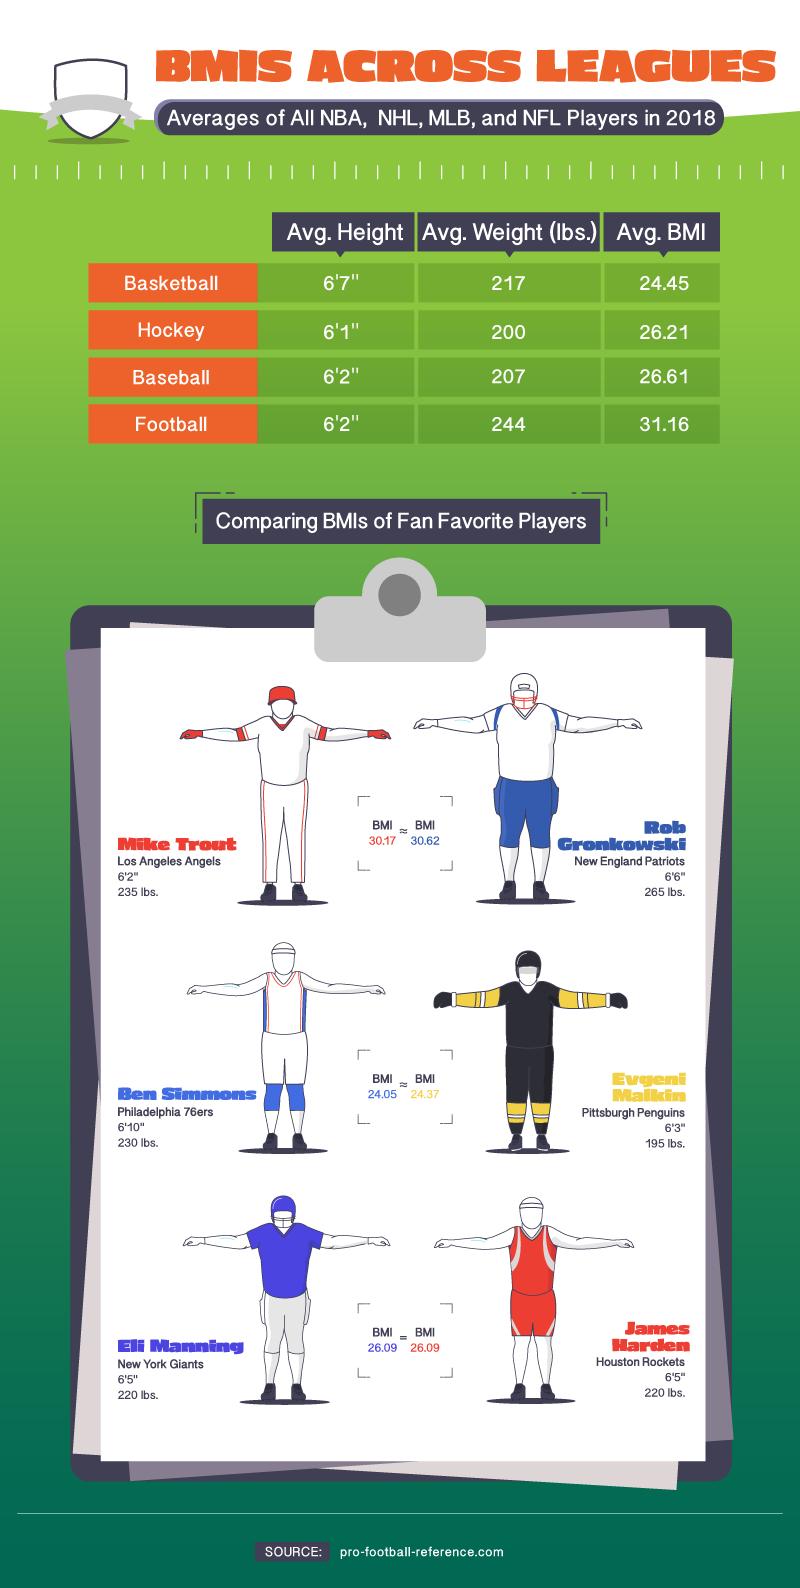 average-bmi-2018-leagues-nfl-nba-nhl-mlb